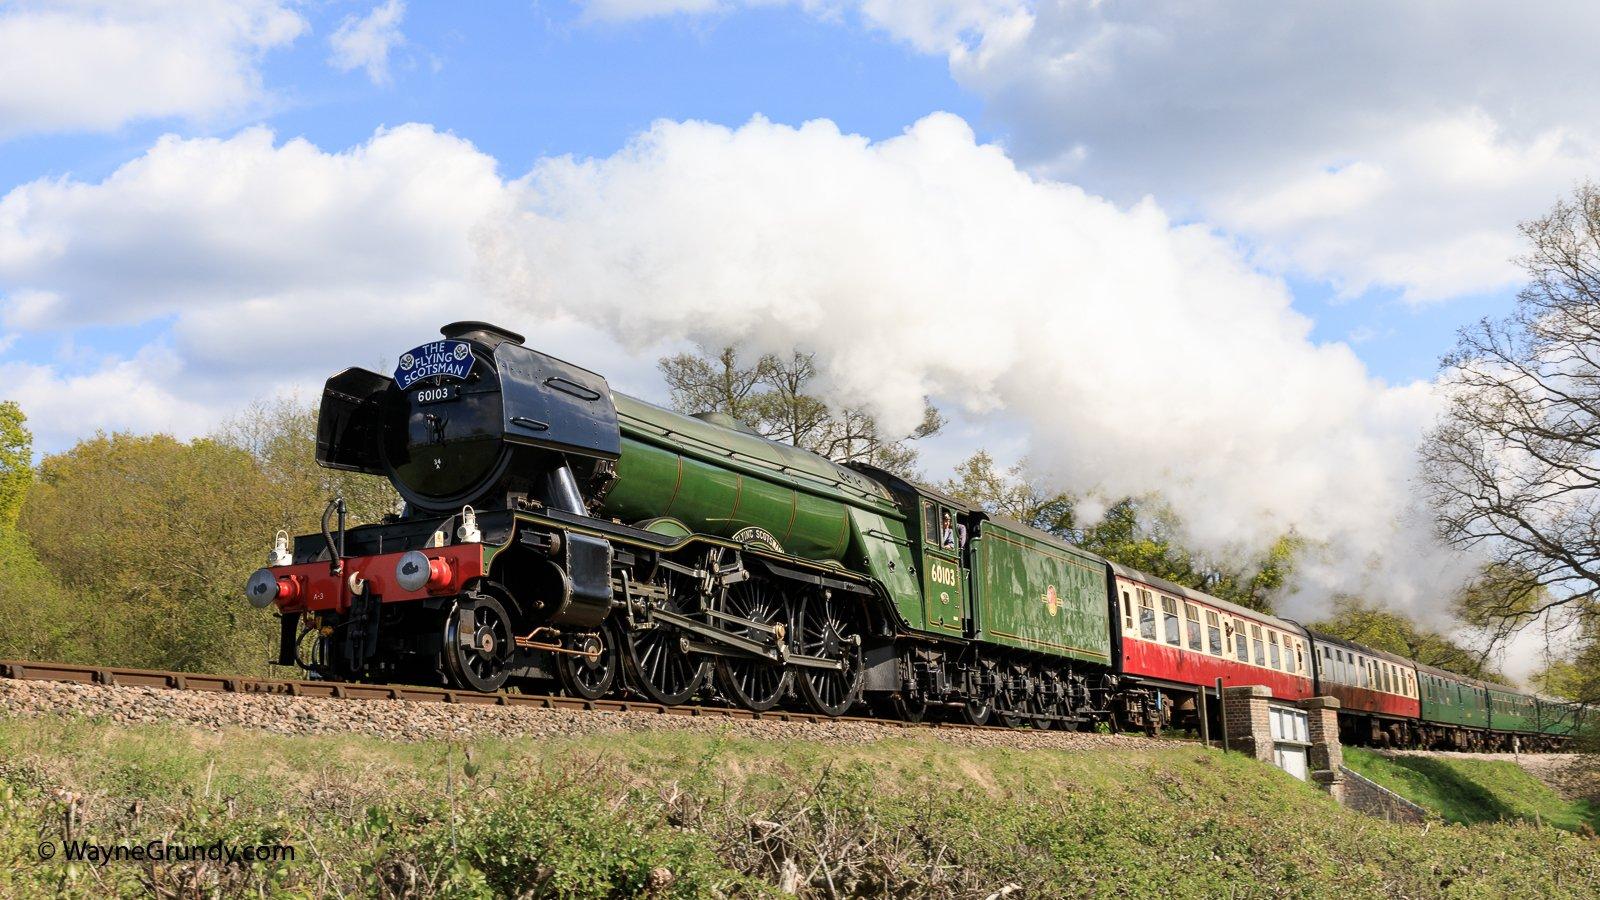 The Flying Scotsman Wayne Grundys PhotoTech Blog 1600x900